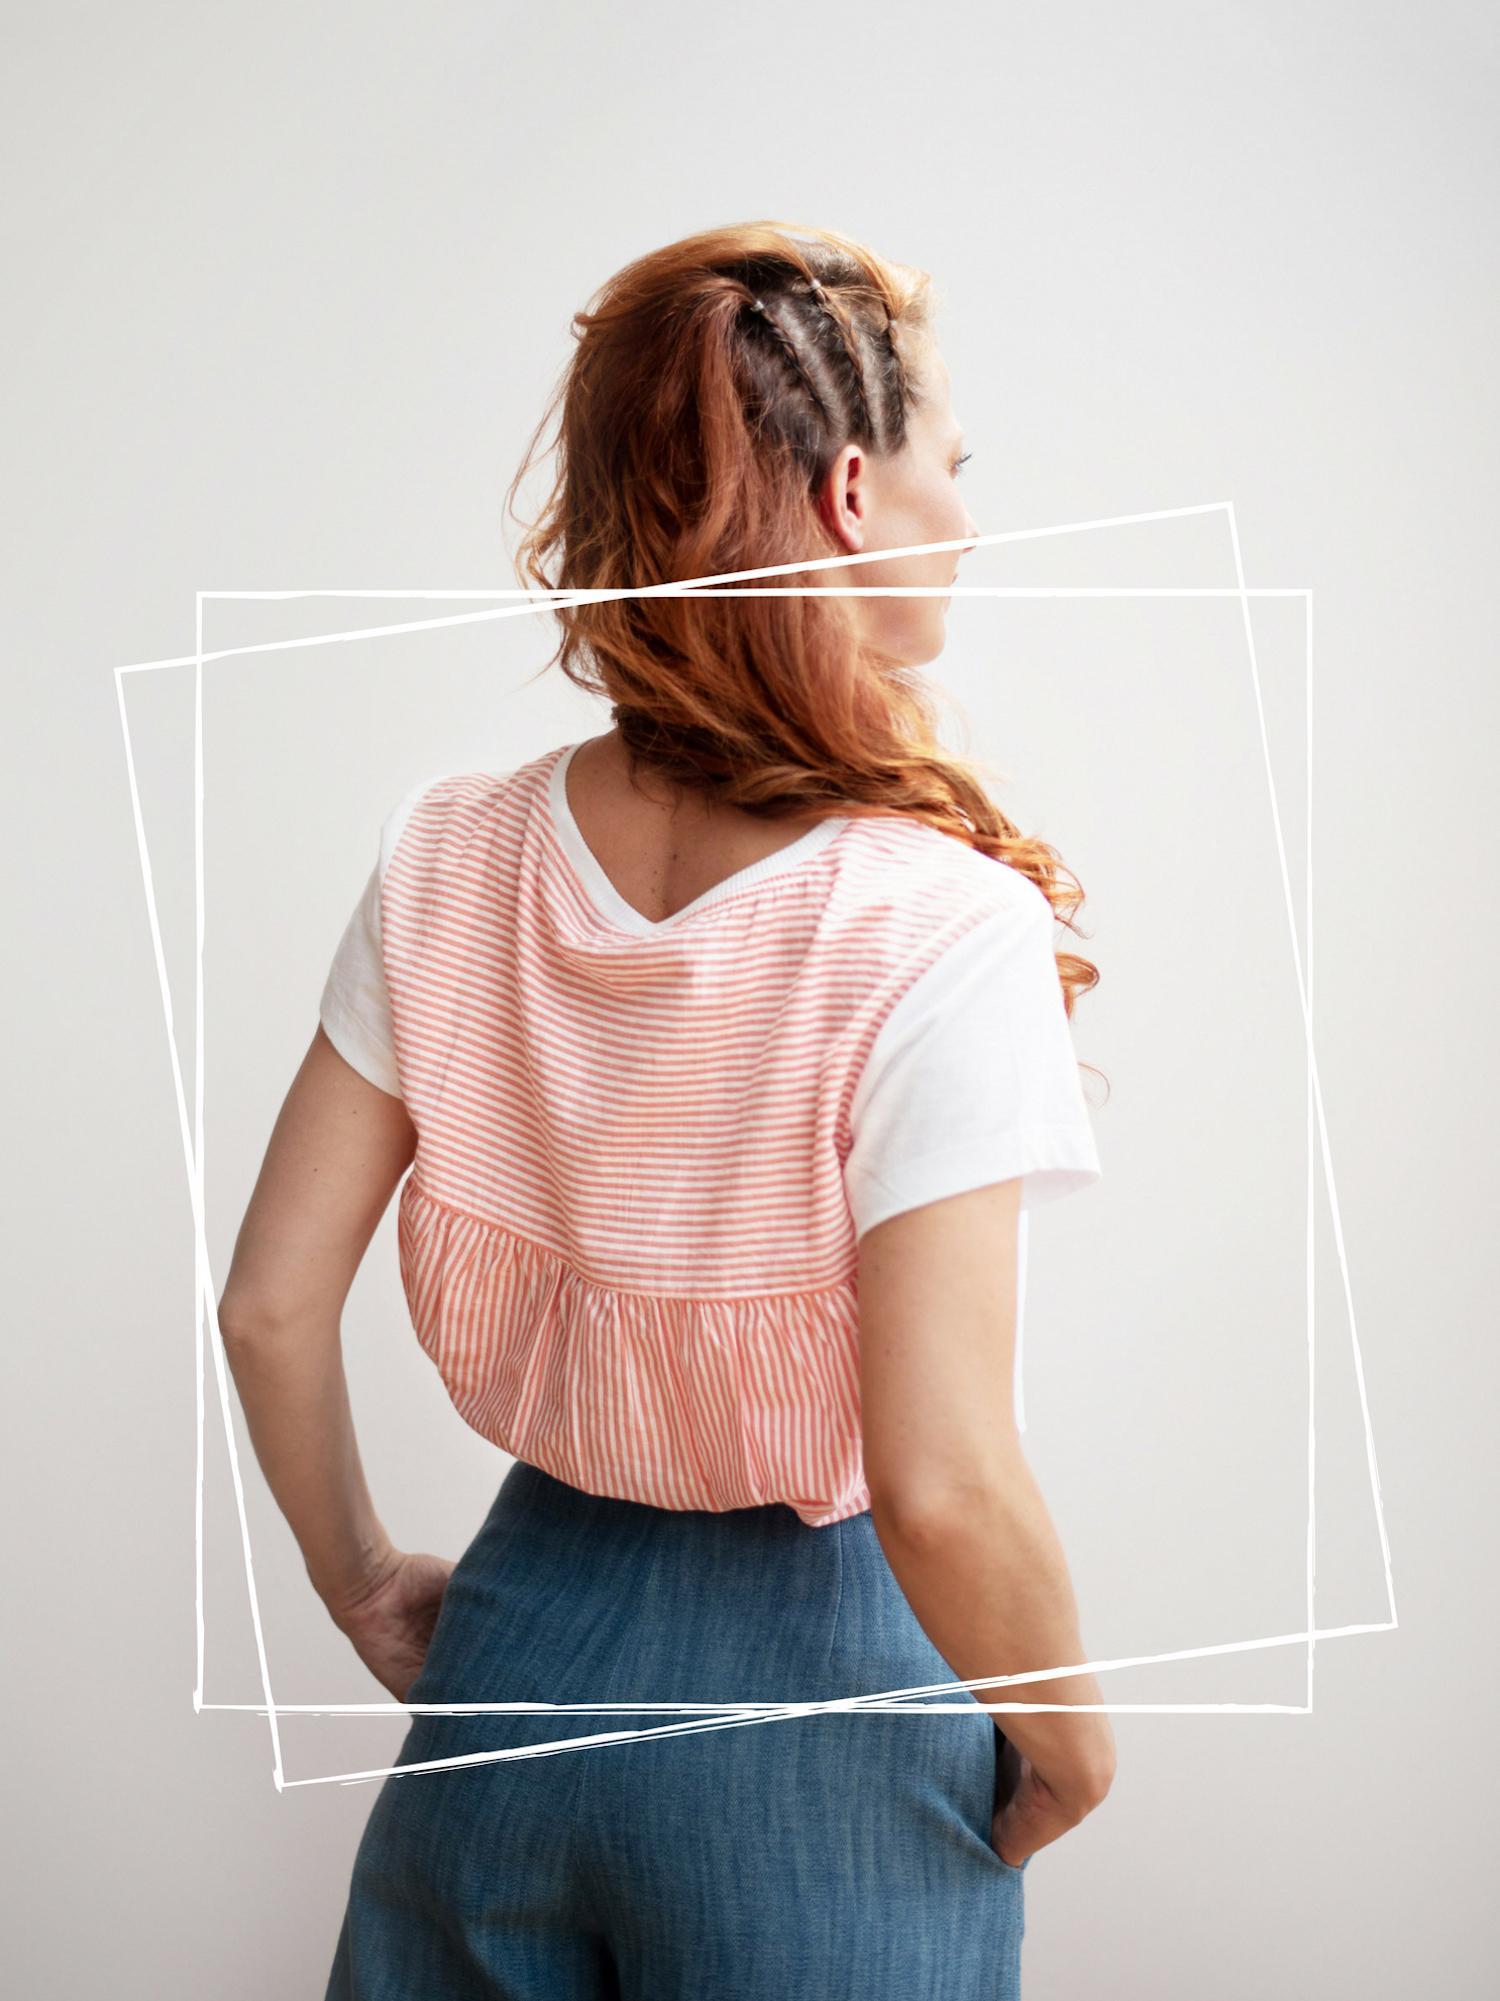 sustainable trajnostno majica eko bombaz marx organic nika veger modni bloger beautyfullblog